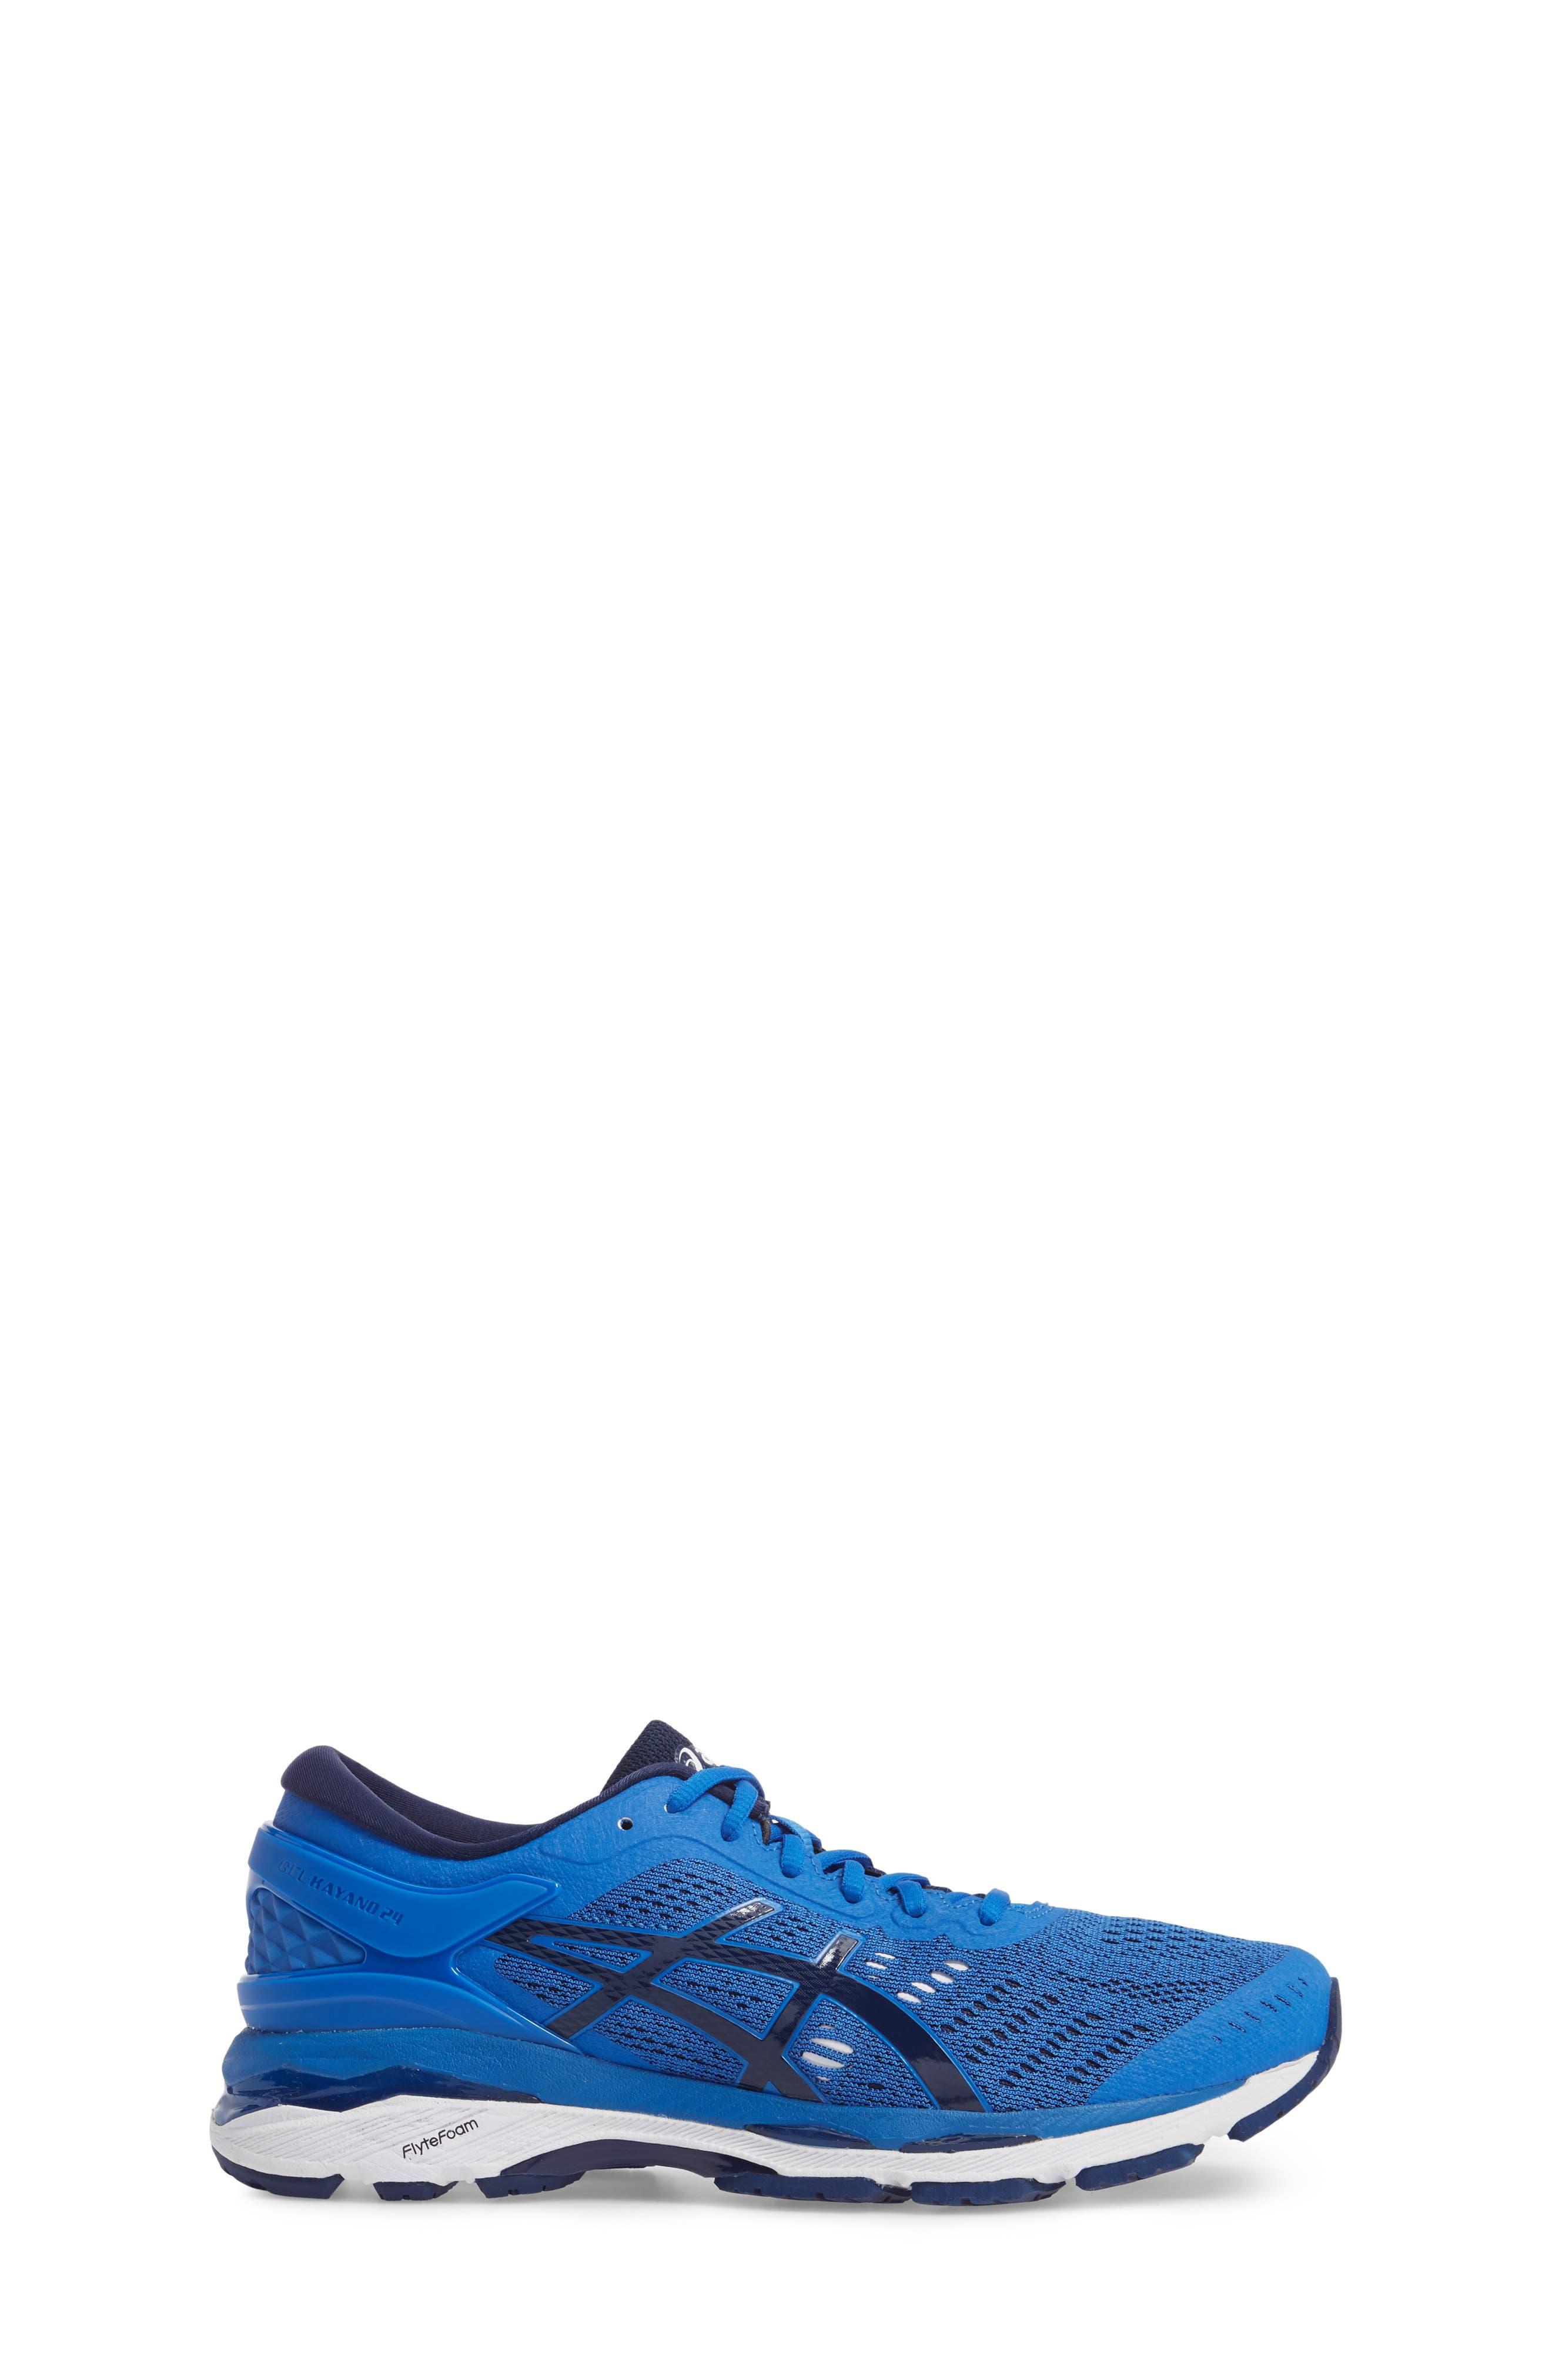 GEL-Kayano<sup>®</sup> 24 GS Running Shoe,                             Alternate thumbnail 5, color,